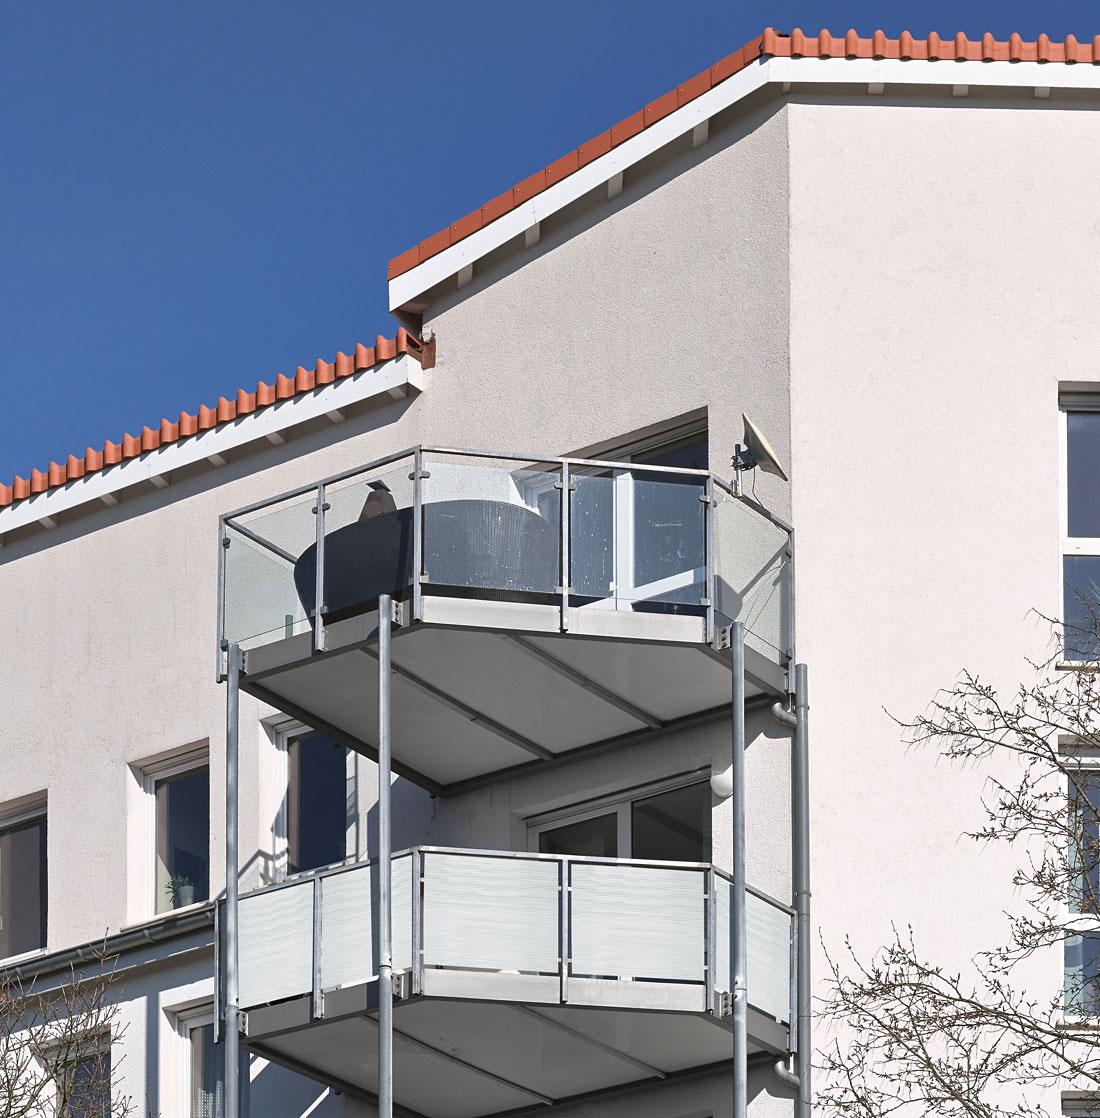 Polyrattan Sichtschutz Balkon Zaun 3 X 0 9 M Gartenfreude